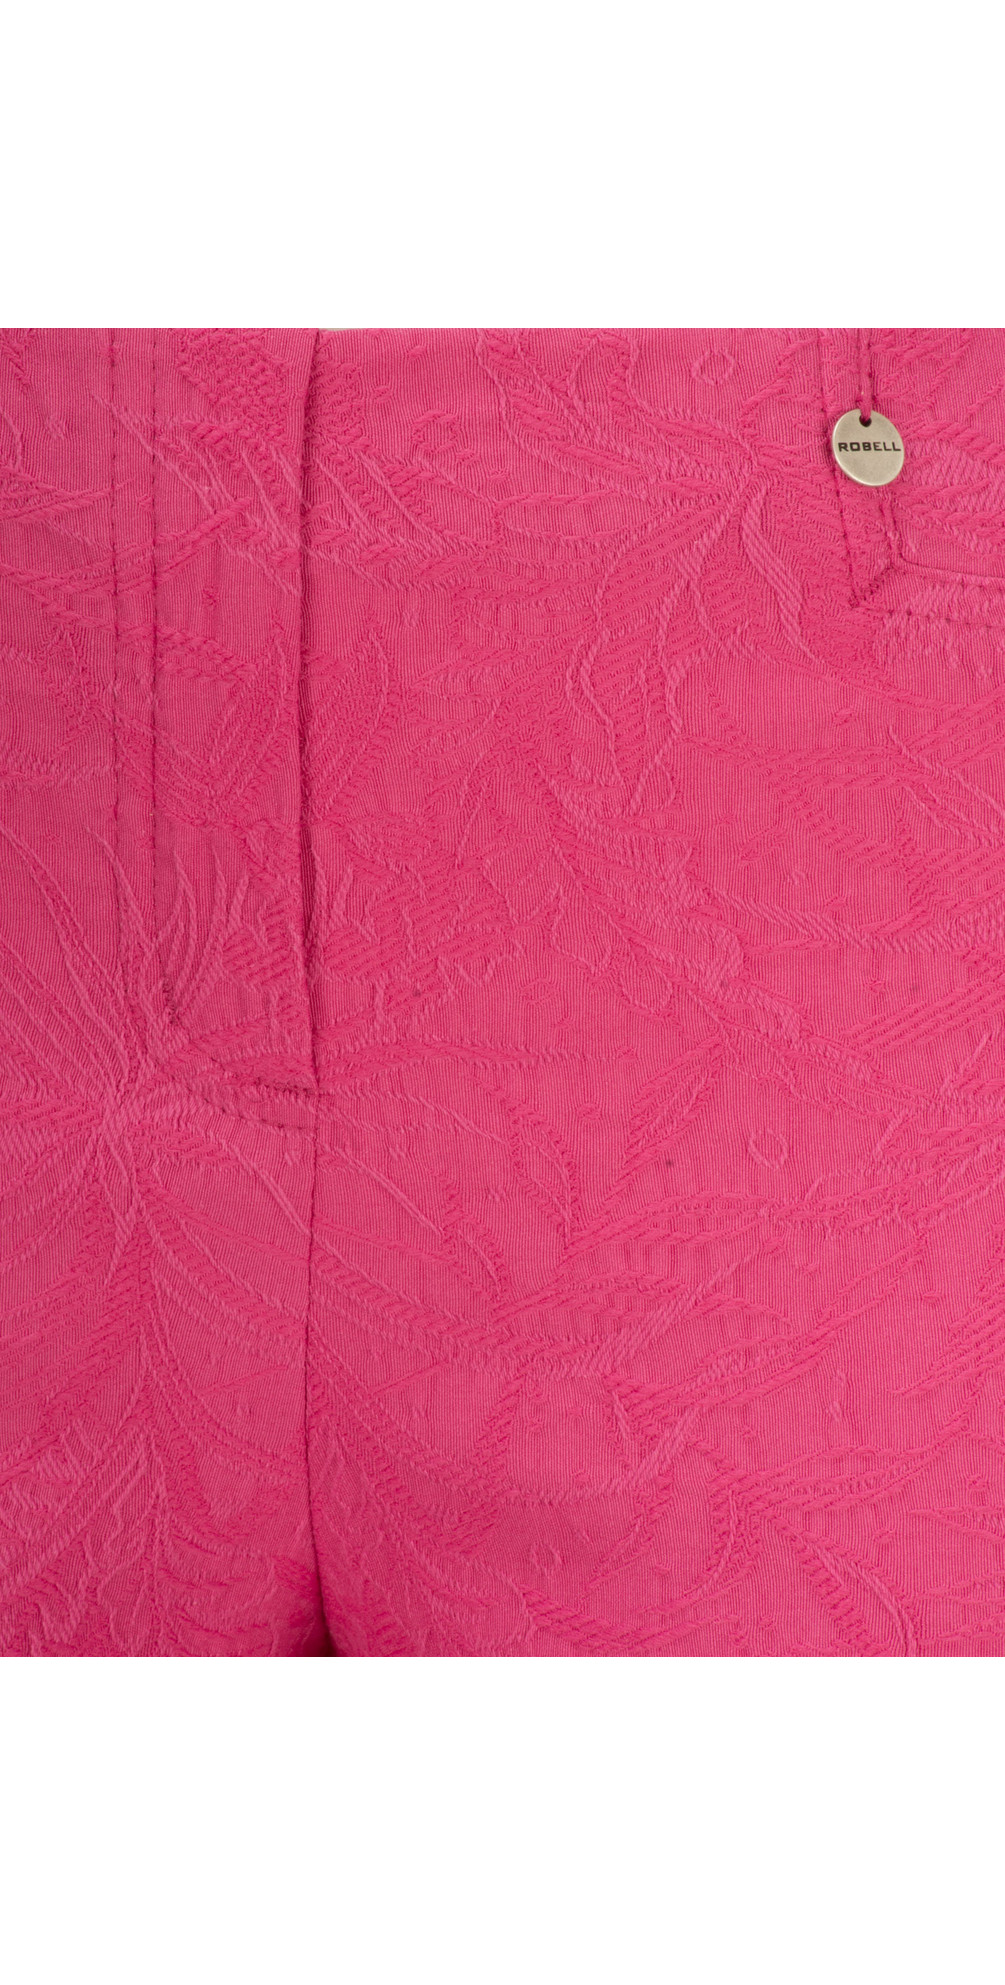 Rose 09 Jacquard Slimfit 7/8 Trouser main image